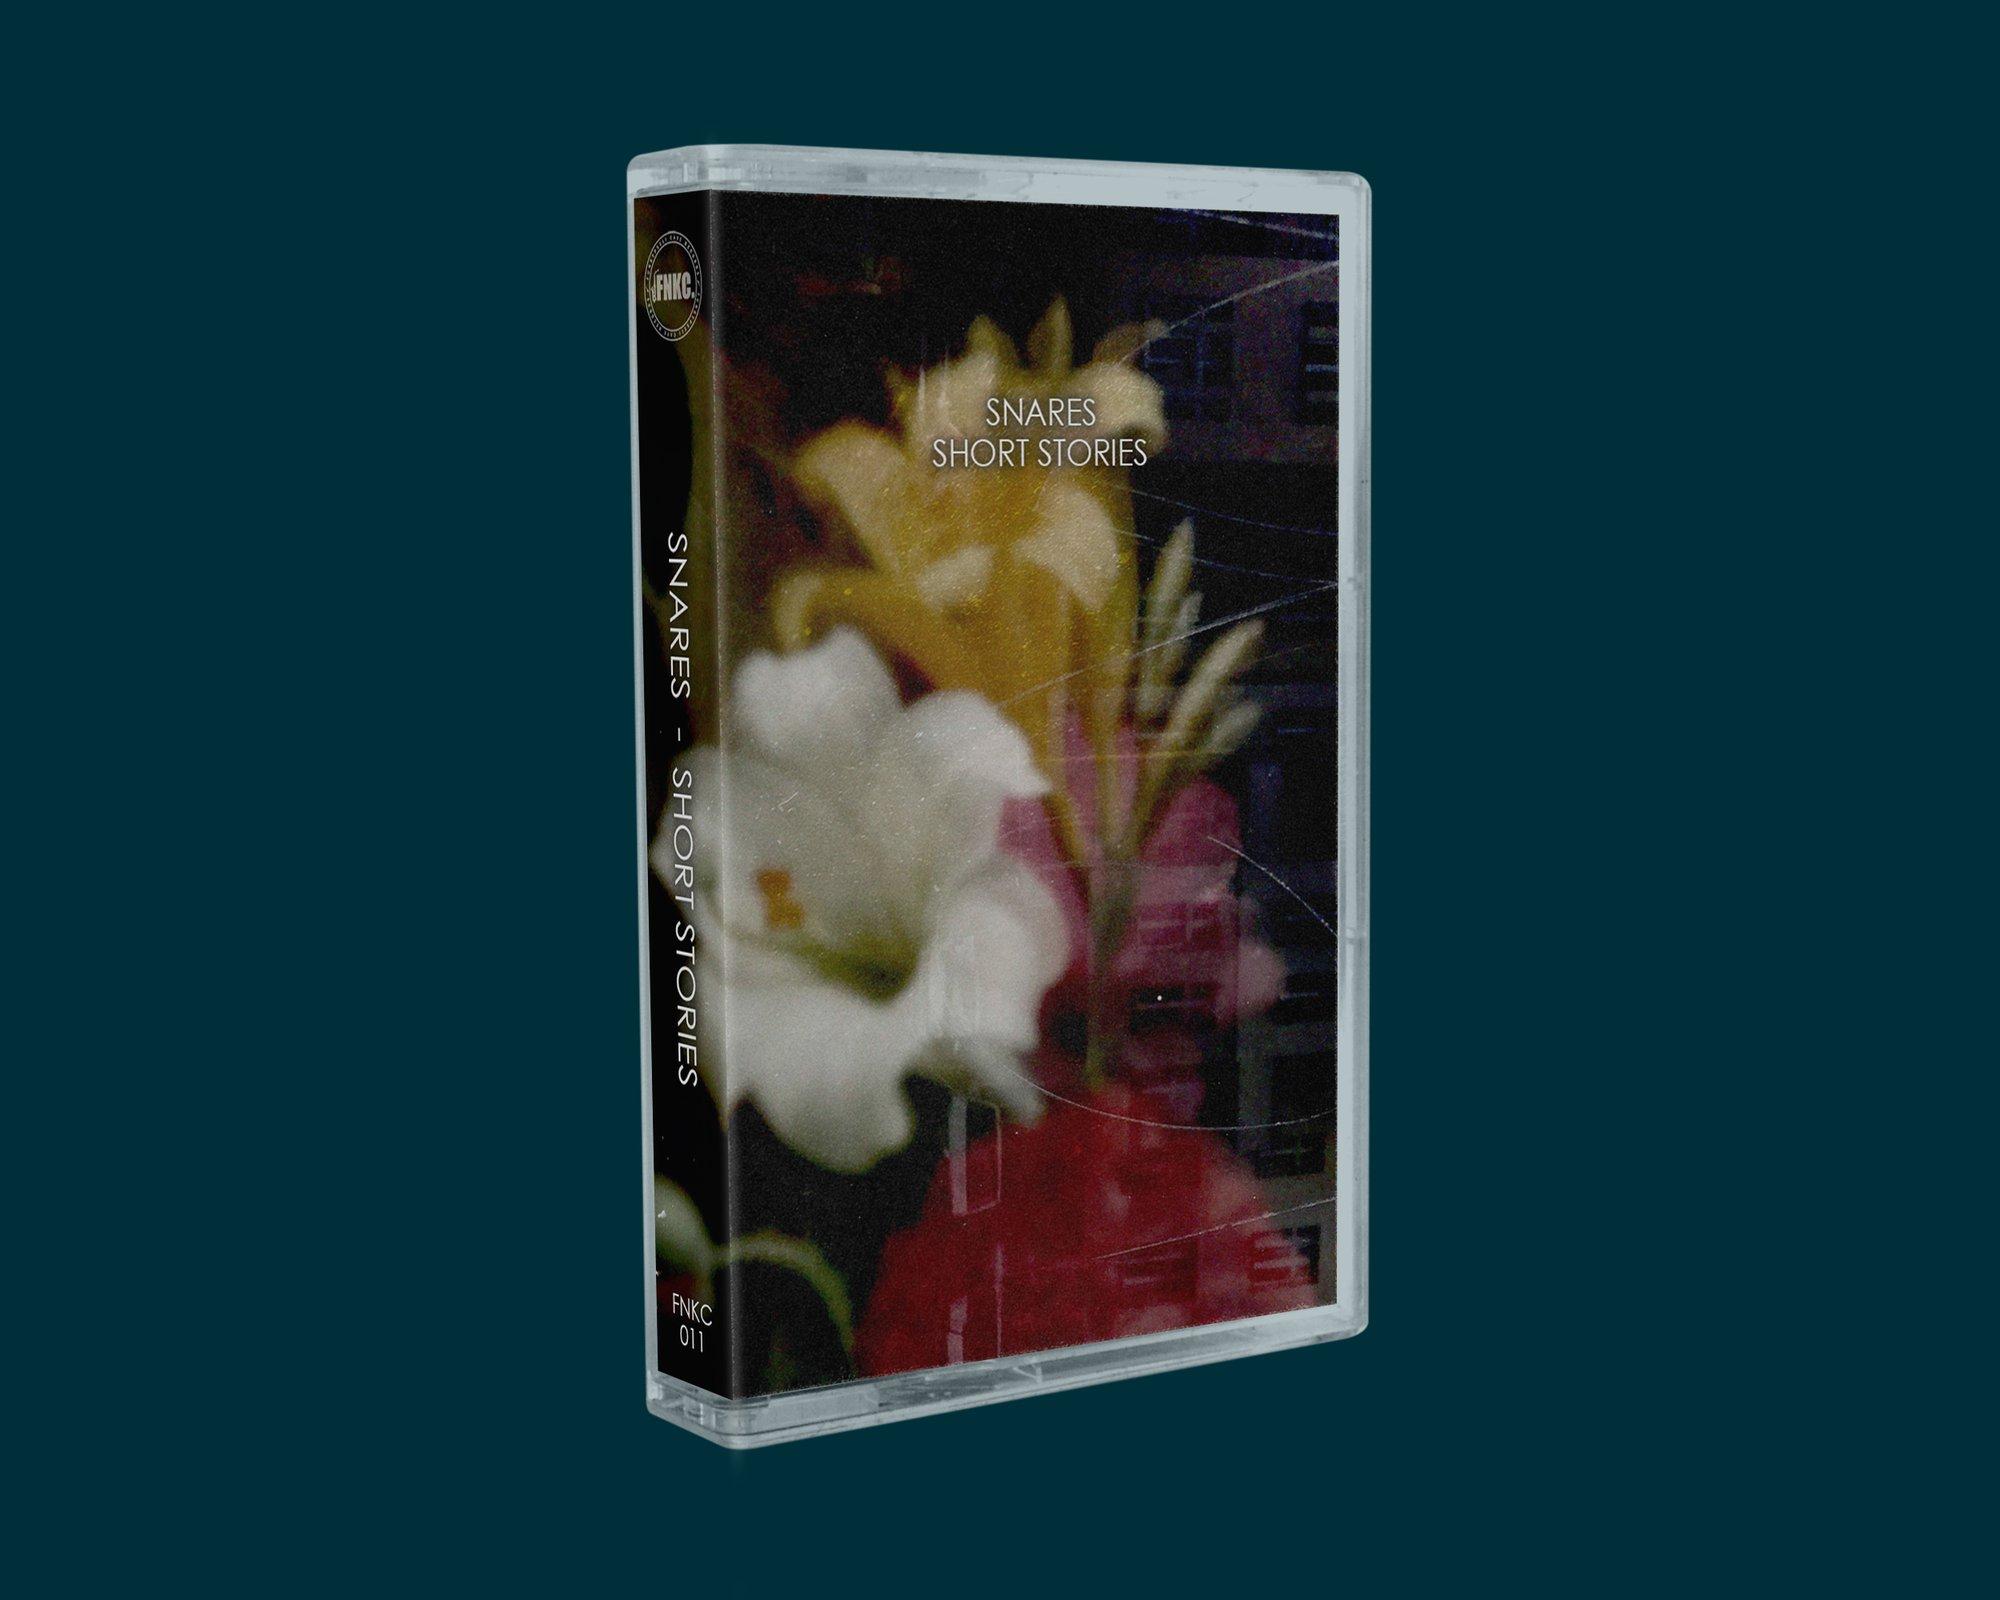 Snares - Short Stories (Cassette)